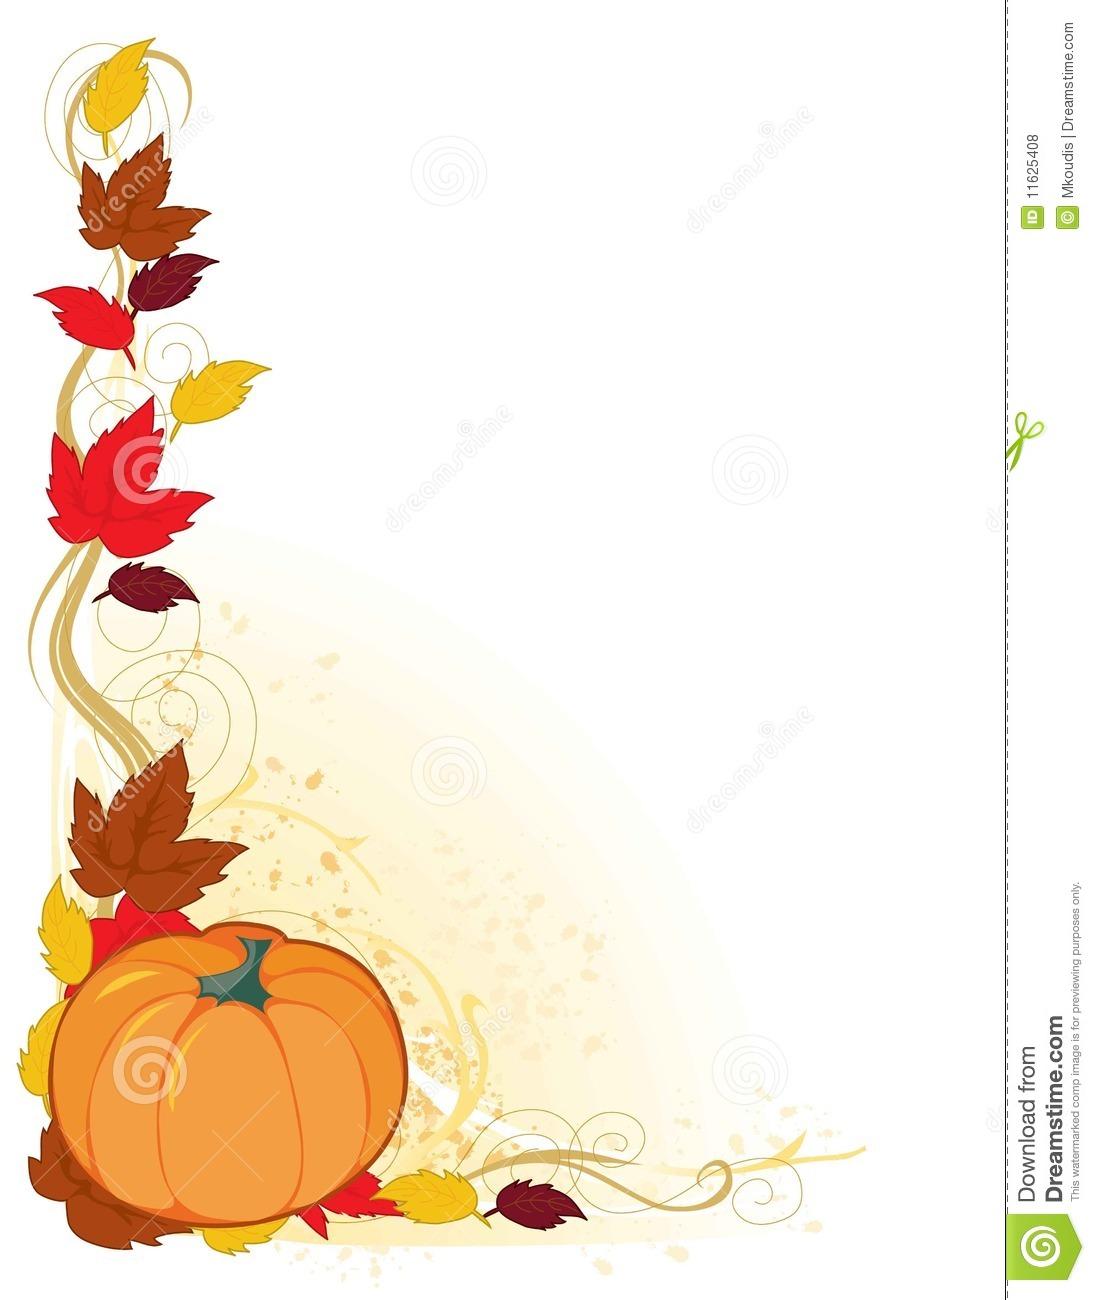 Fall Pumpkin Border Clipart.